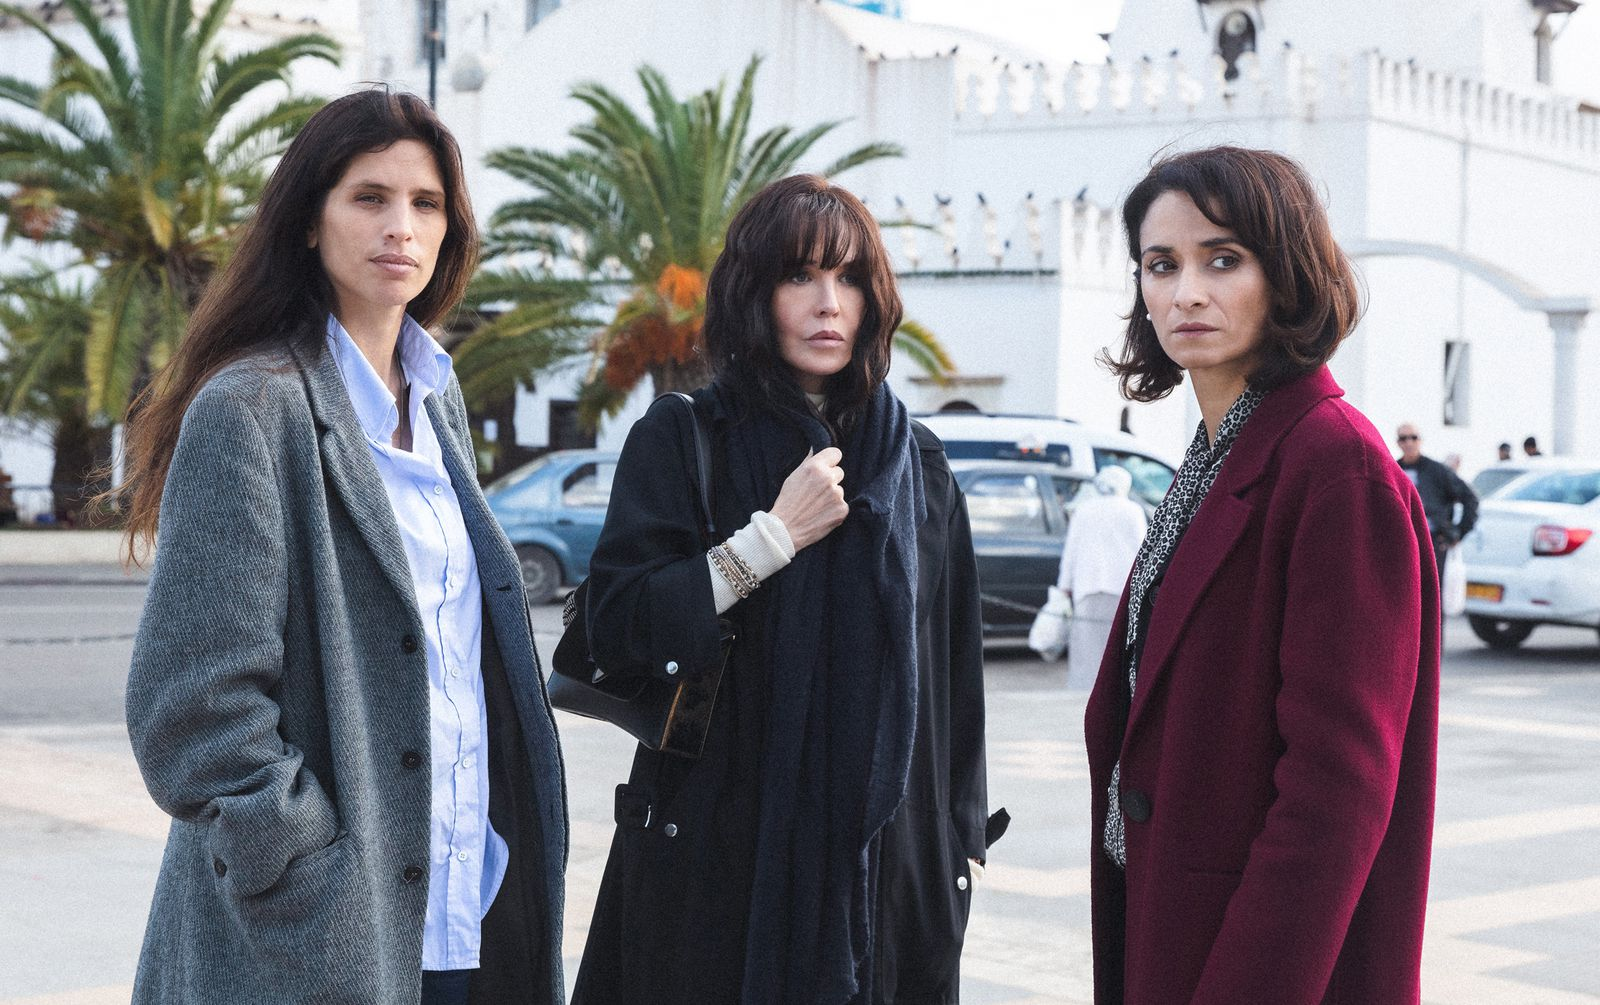 SŒURS (BANDE-ANNONCE) avec Isabelle Adjani, Rachida Brakni, Maïwenn, Hafsia Herzi - Le 30 juin 2021 au cinéma